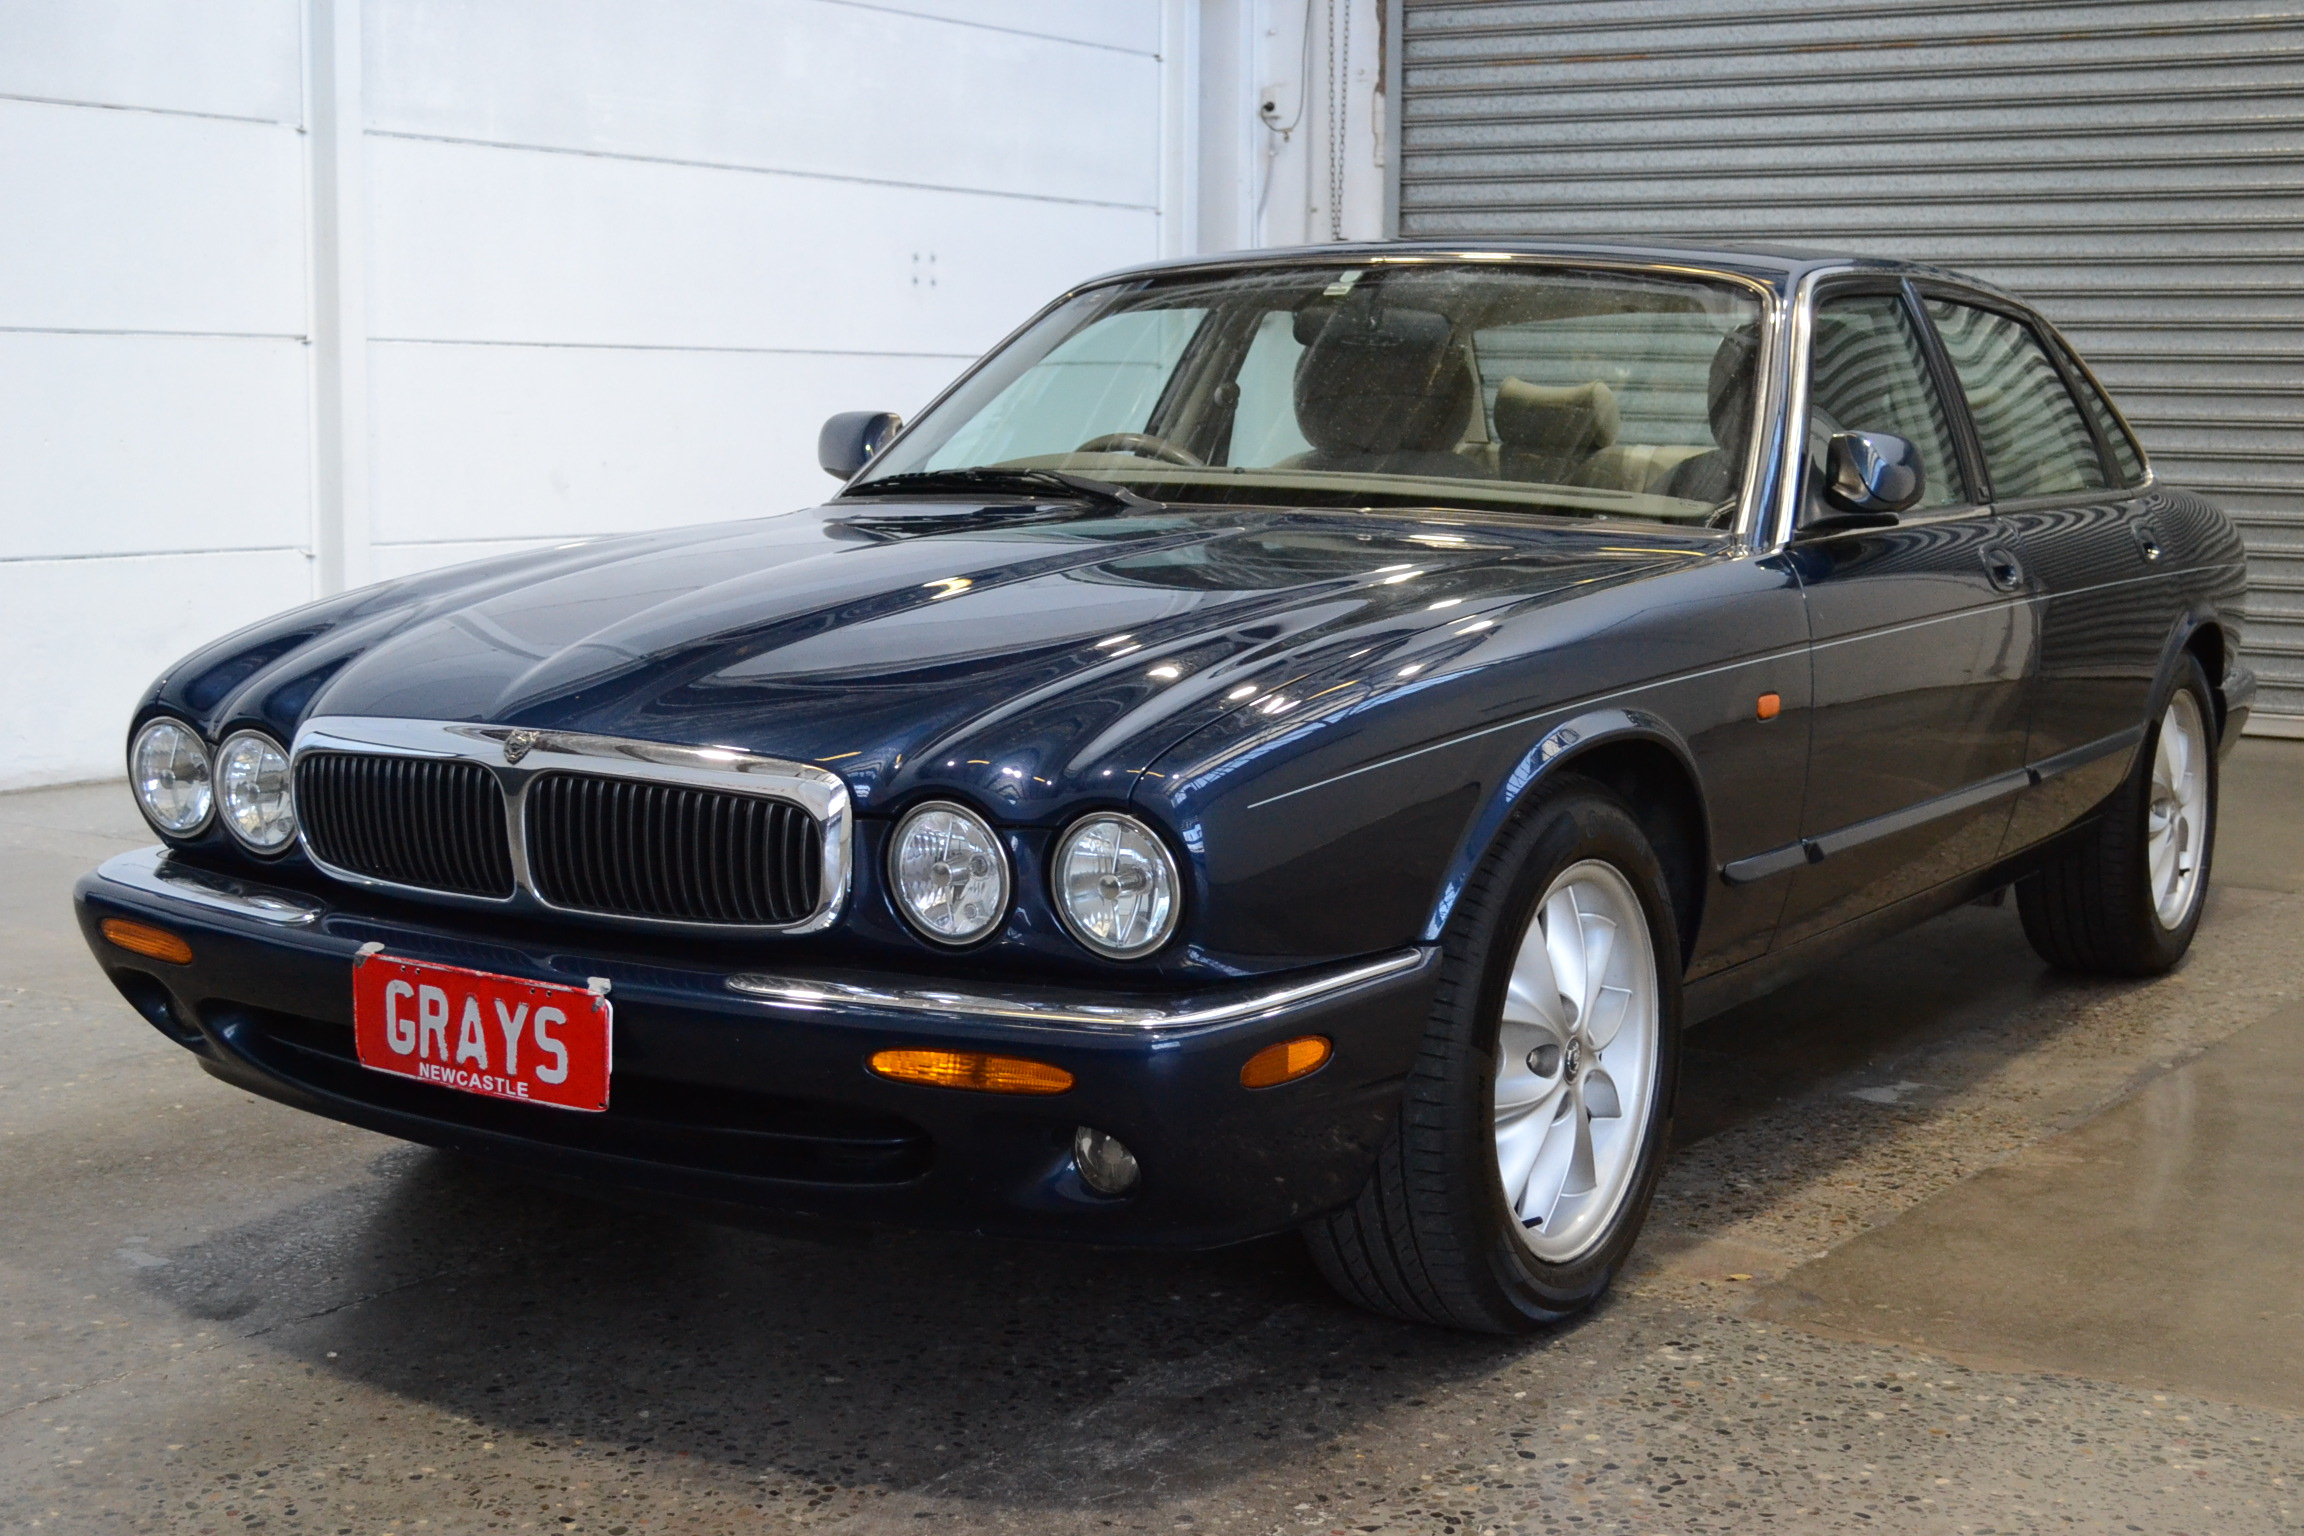 1997 Jaguar XJ8 3.2 X300 Automatic Sedan